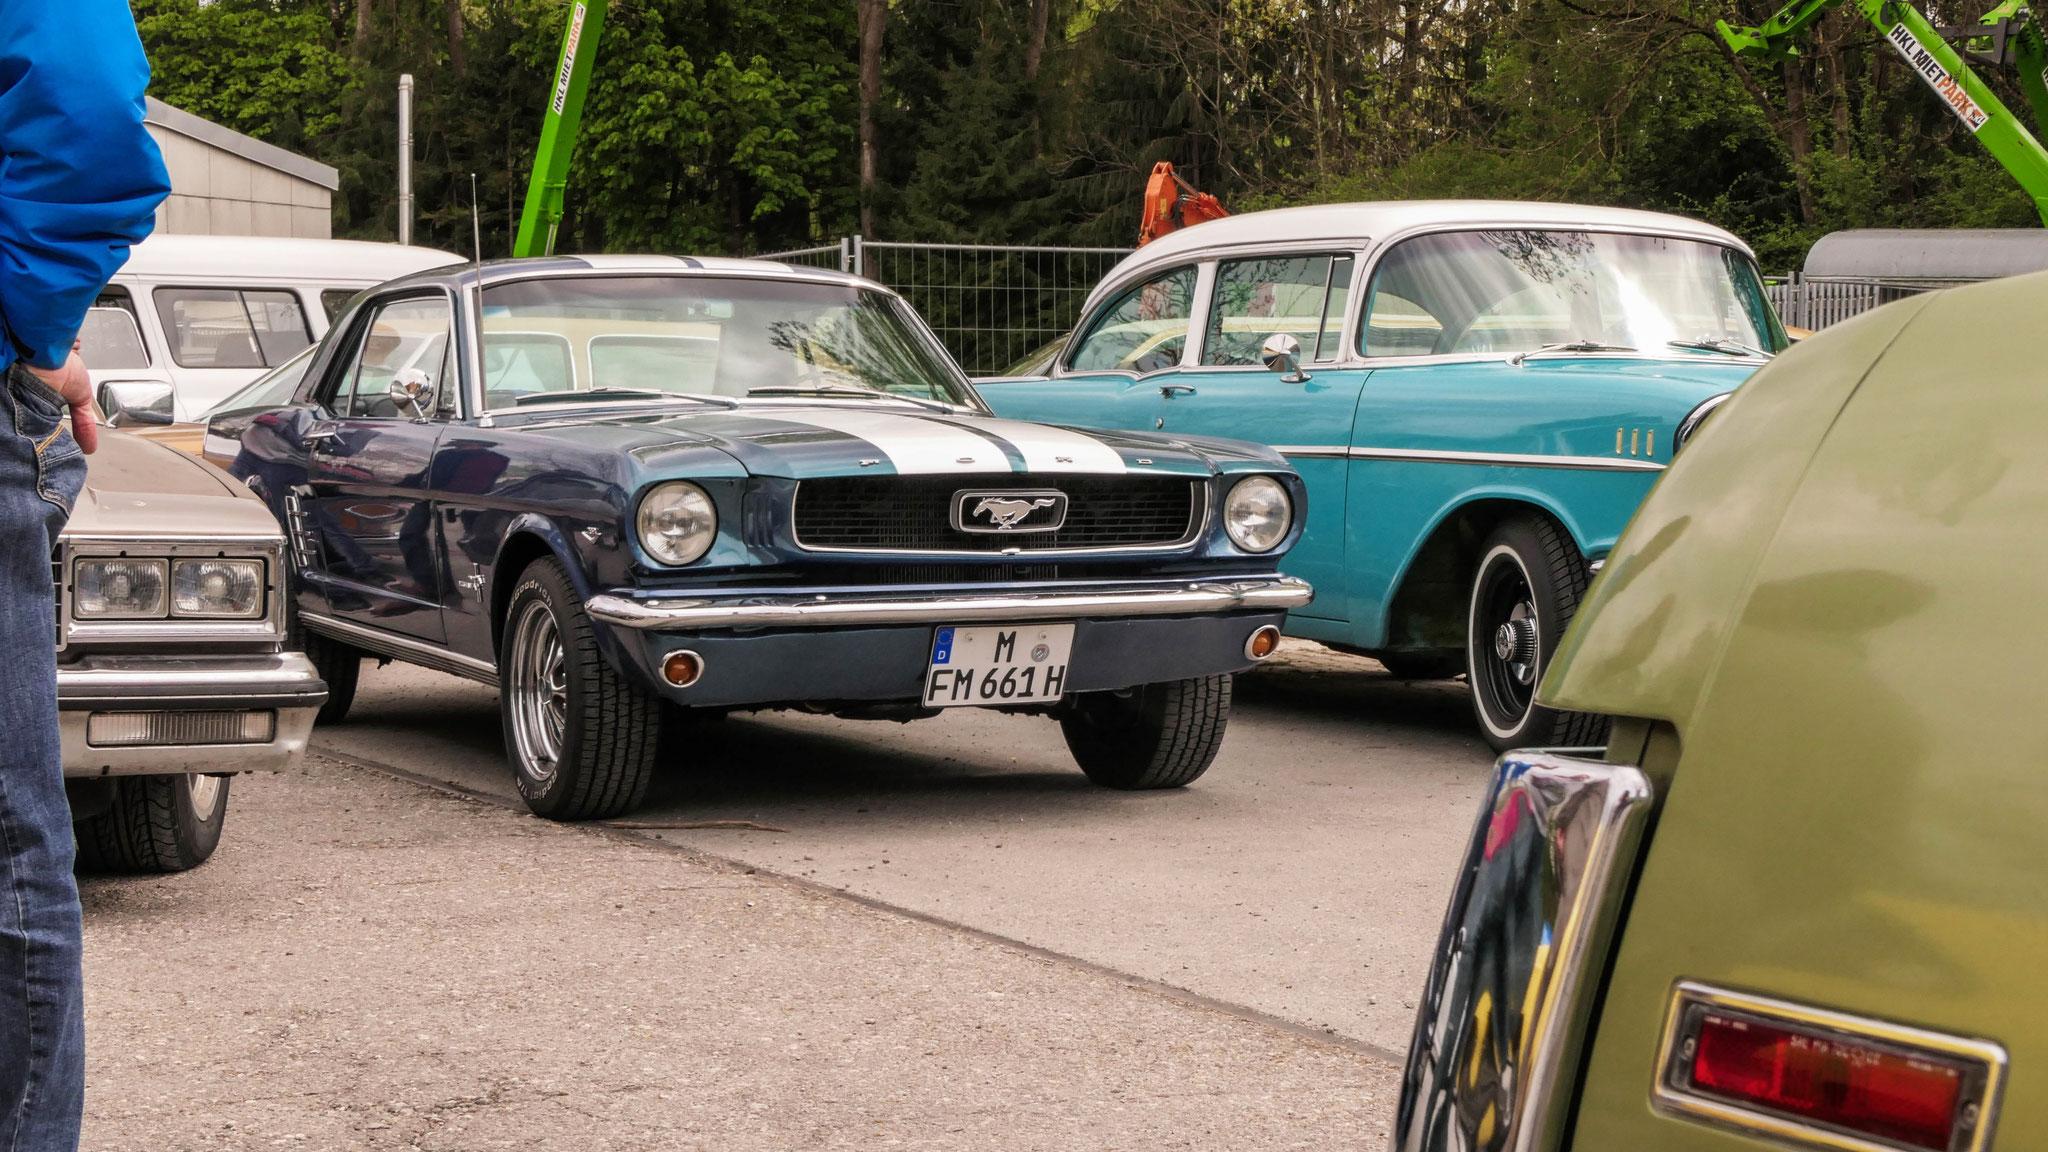 Mustang I - M-FM-661H